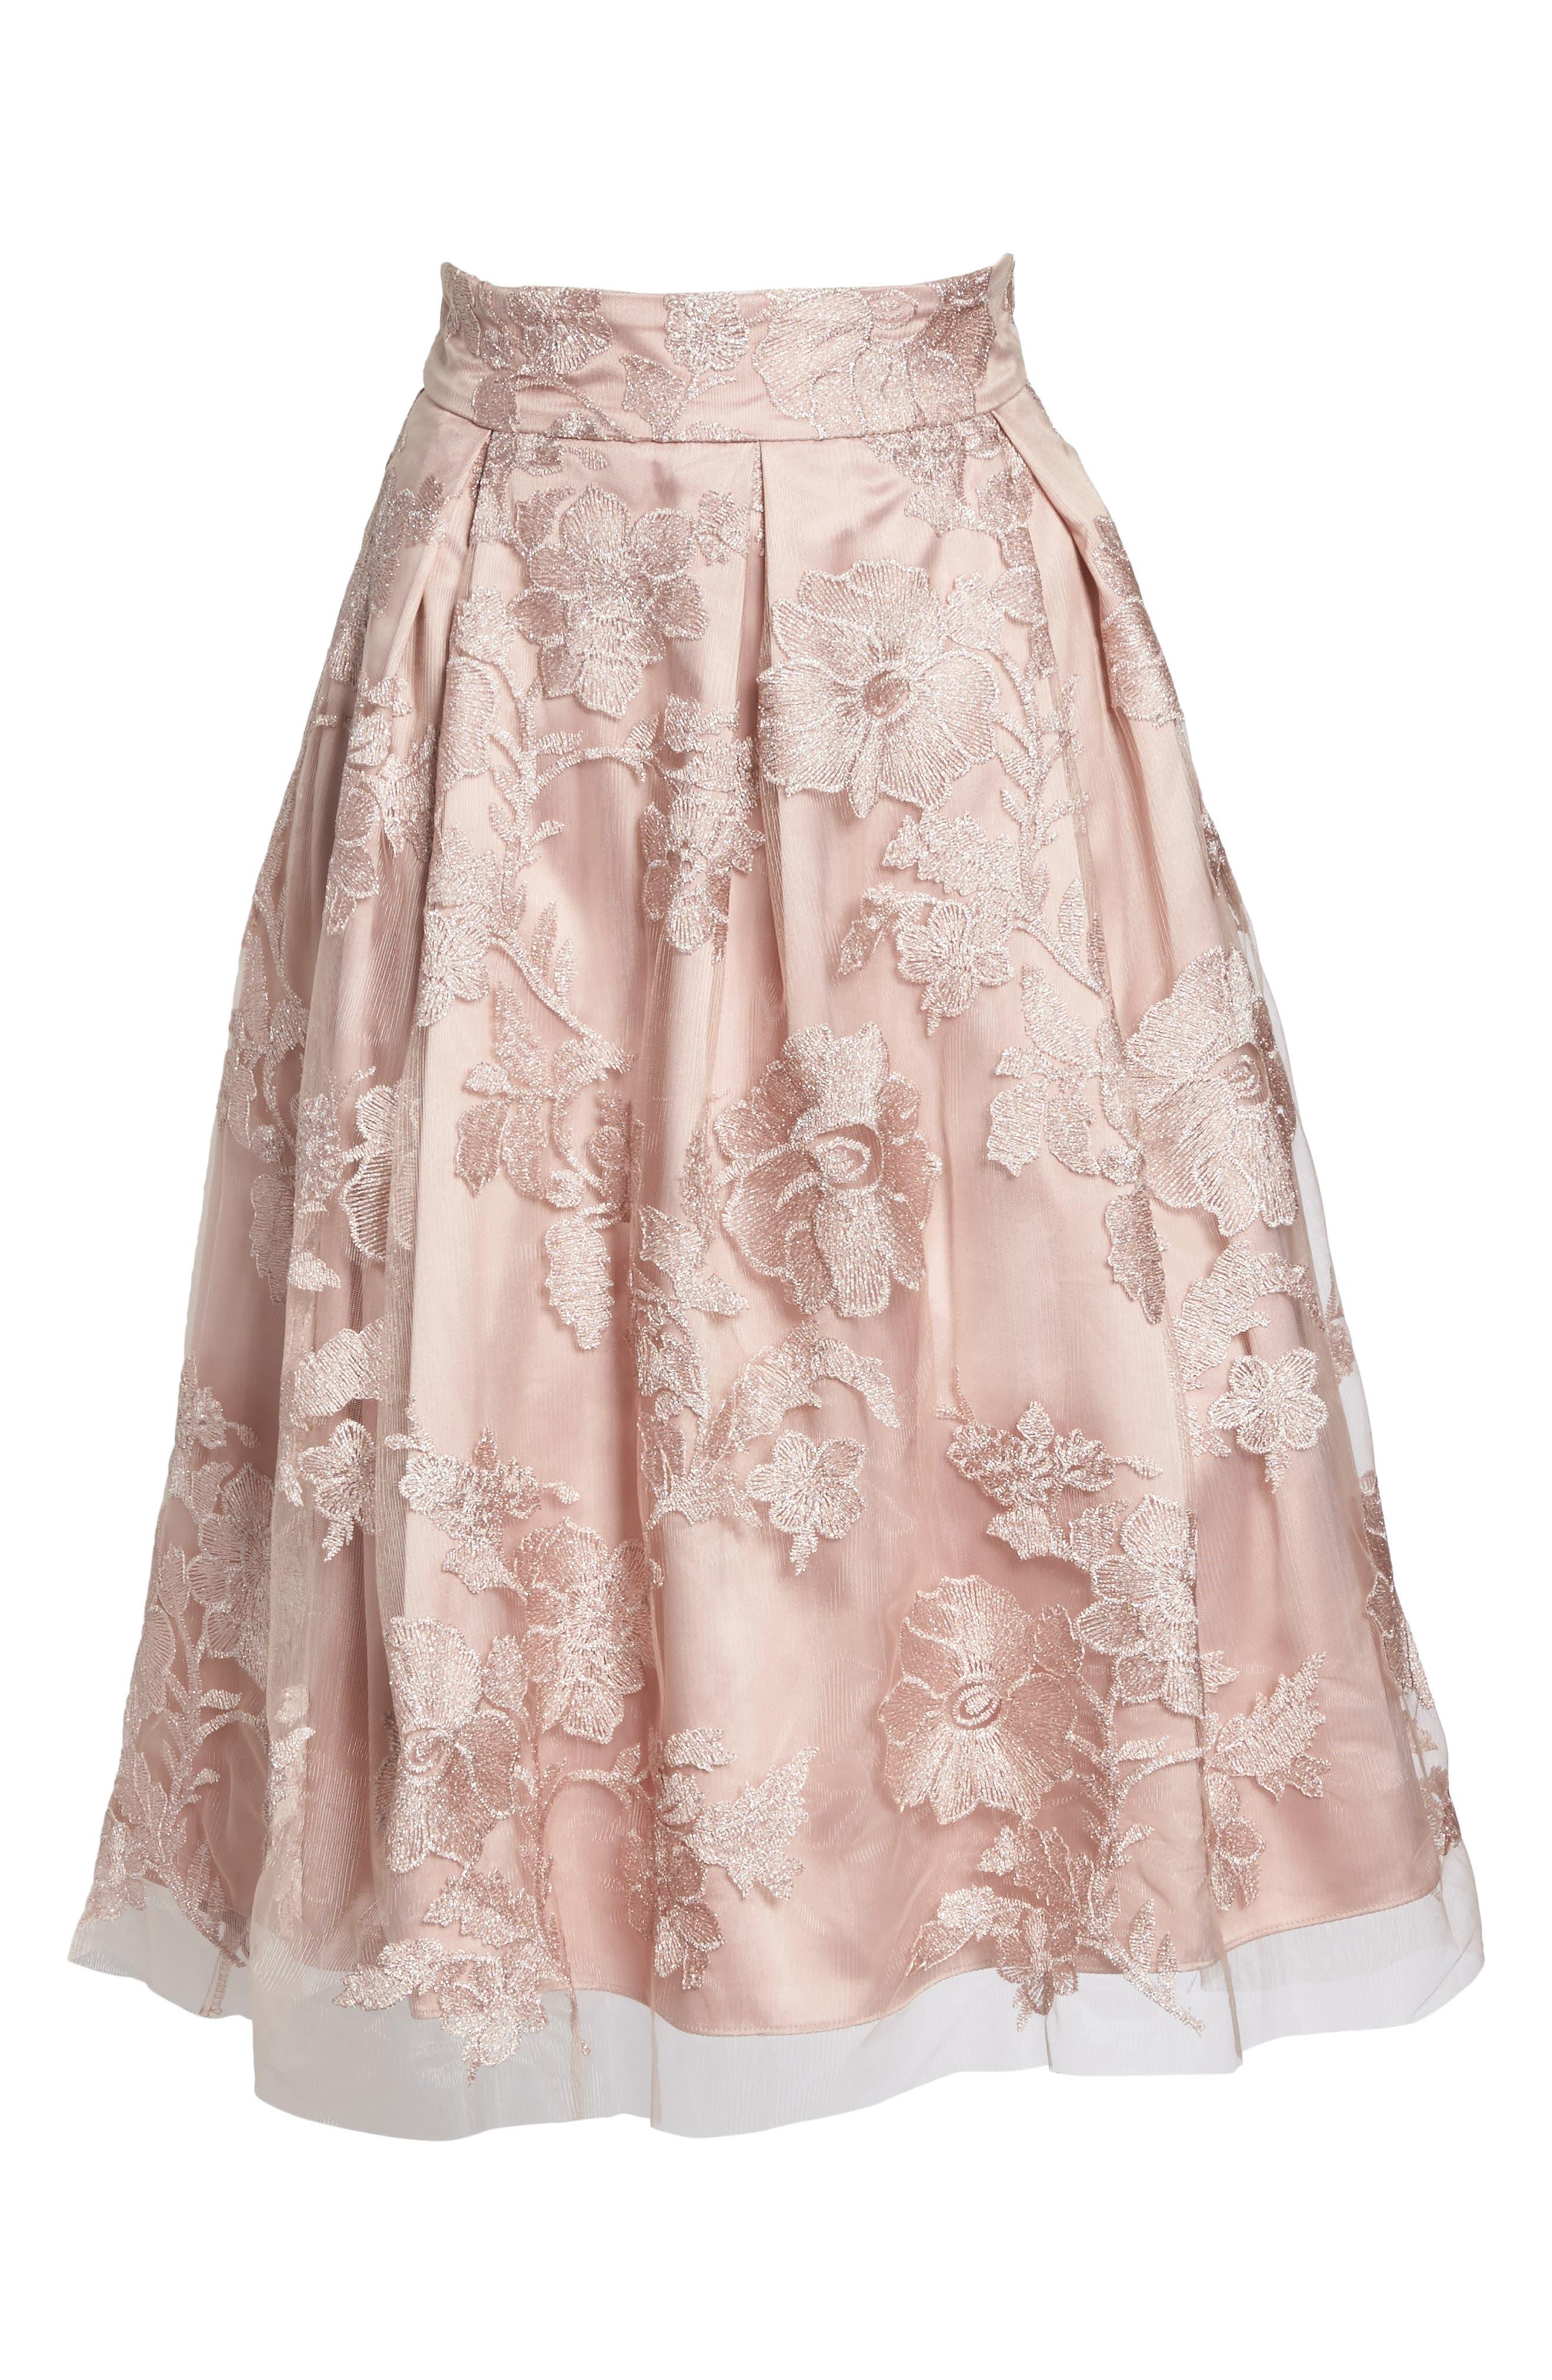 Floral Embroidered Skirt,                             Alternate thumbnail 6, color,                             Blush